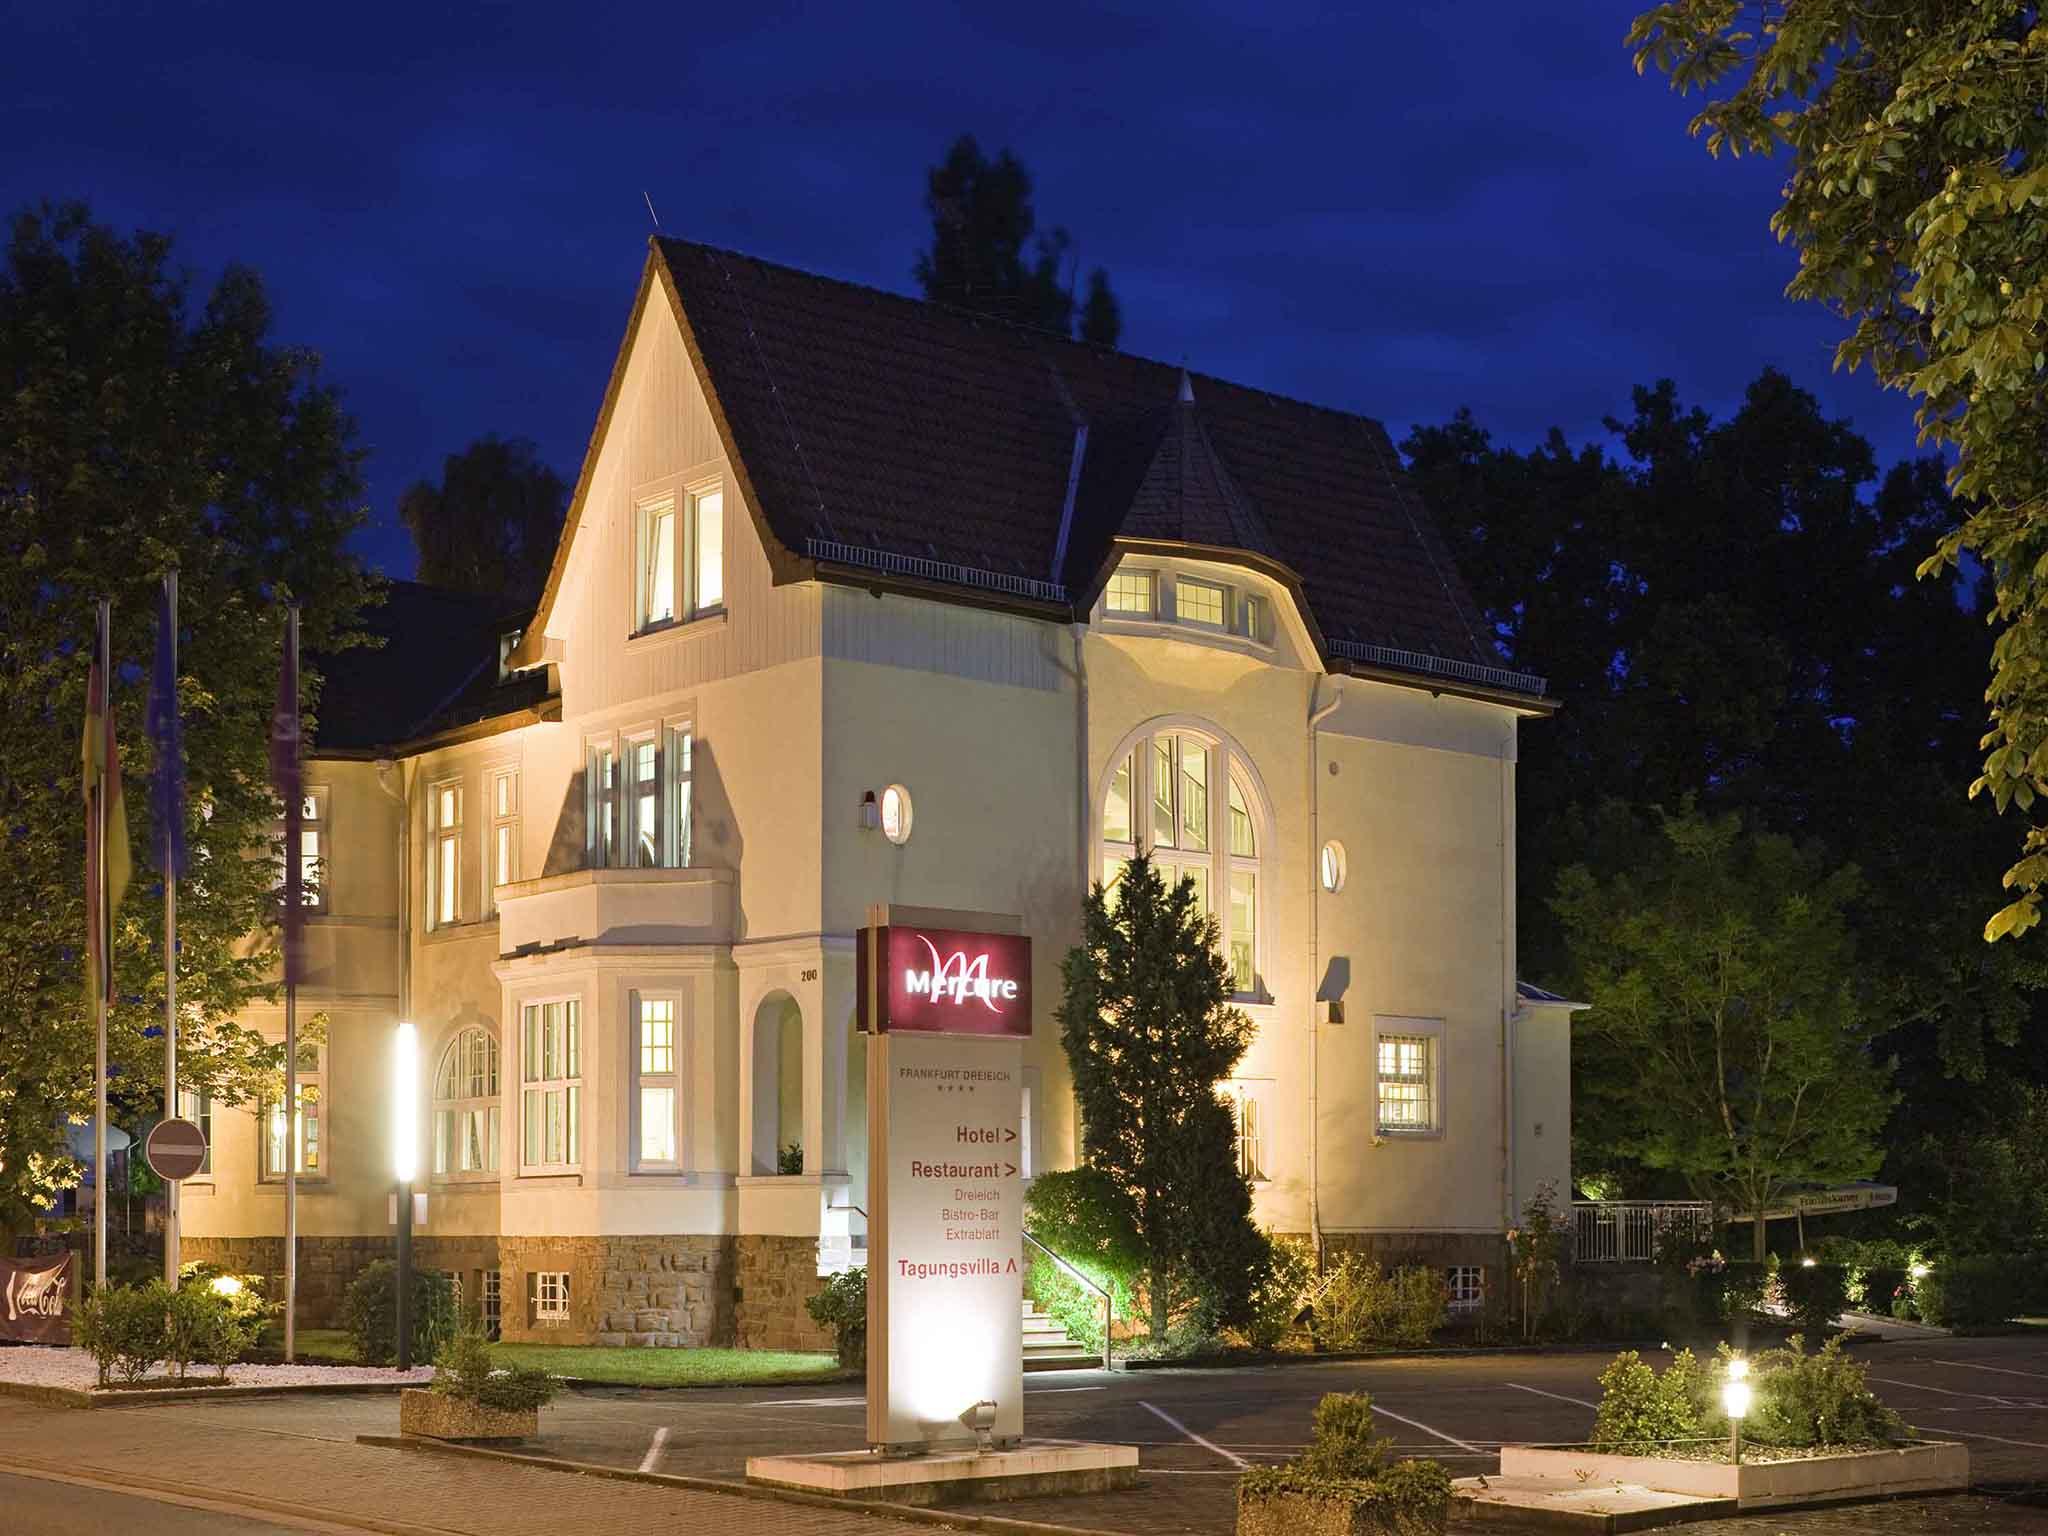 فندق - فندق مركيور MERCURE فرانكفورت إيربورت درا أيش